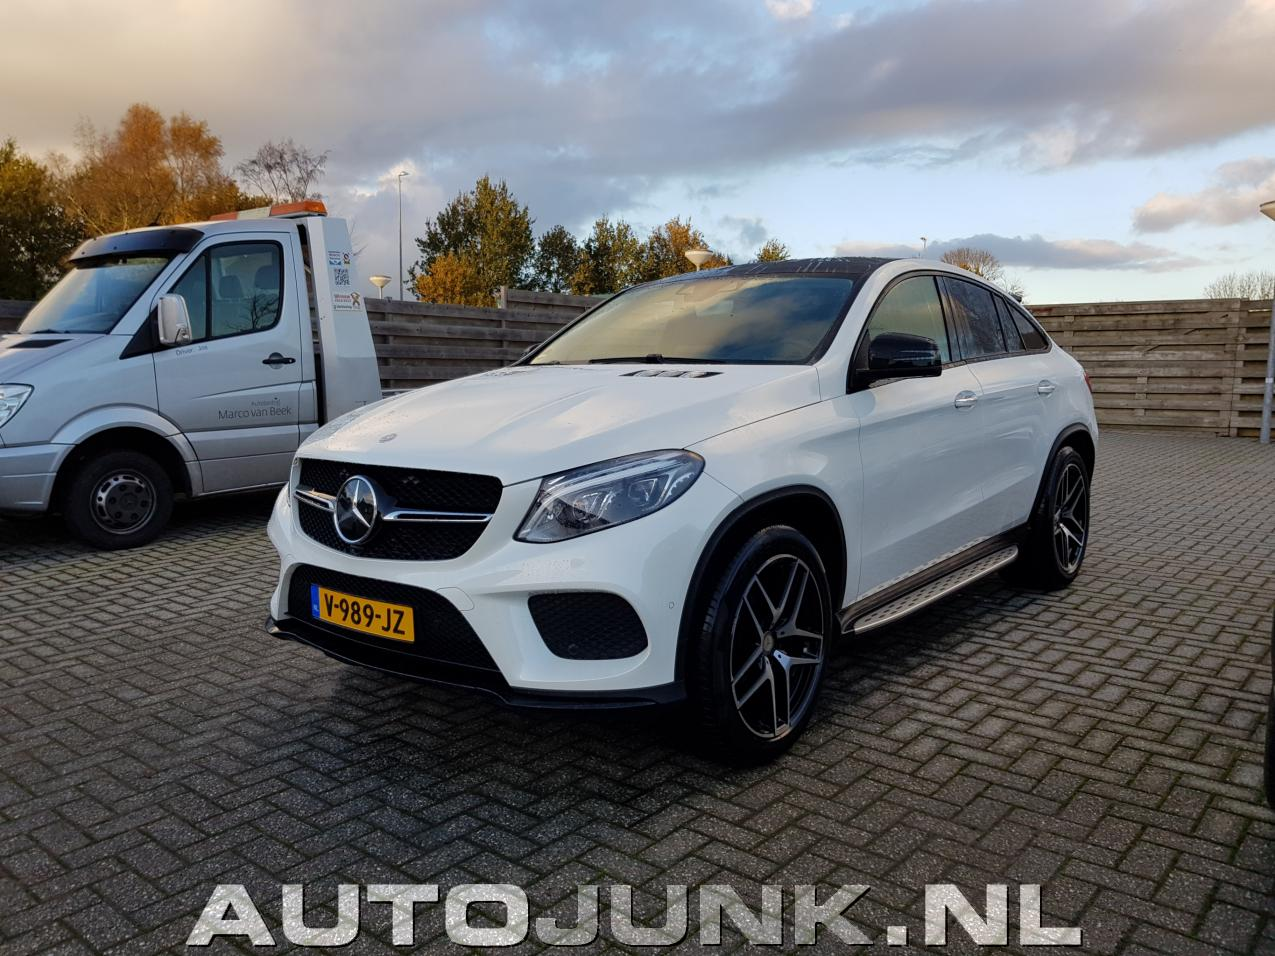 Mooiste bedrijfsauto ter wereld foto\'s » Autojunk.nl (209139)